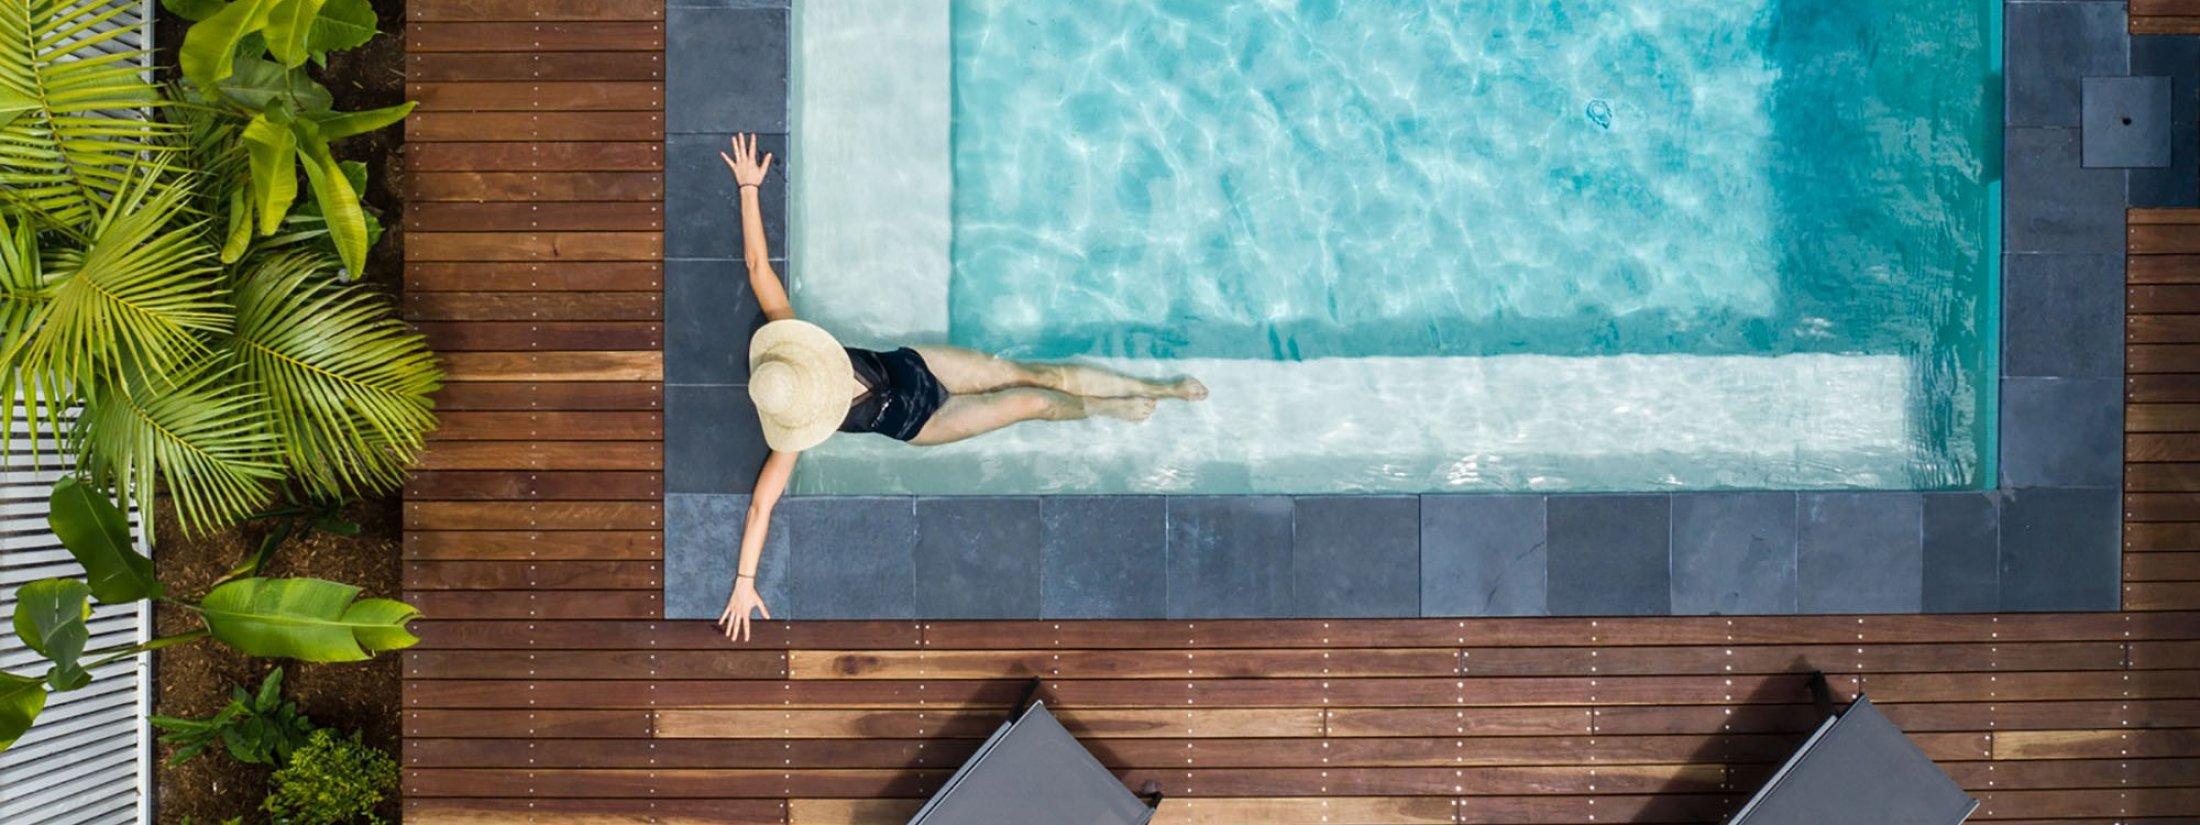 Bamboo Beach House - Byron Bay - Aerial Pool